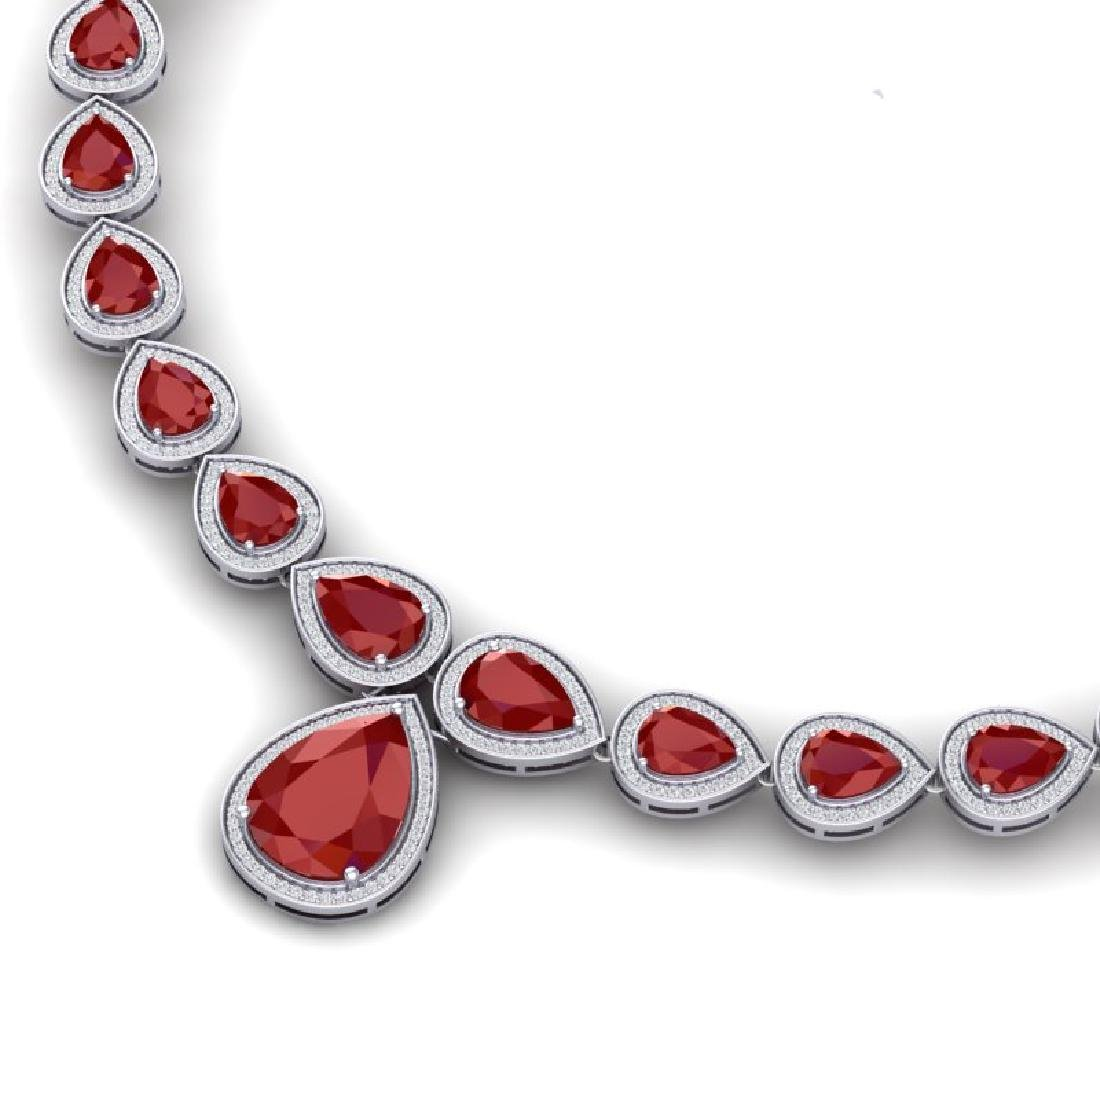 51.41 CTW Royalty Ruby & VS Diamond Necklace 18K White - 2